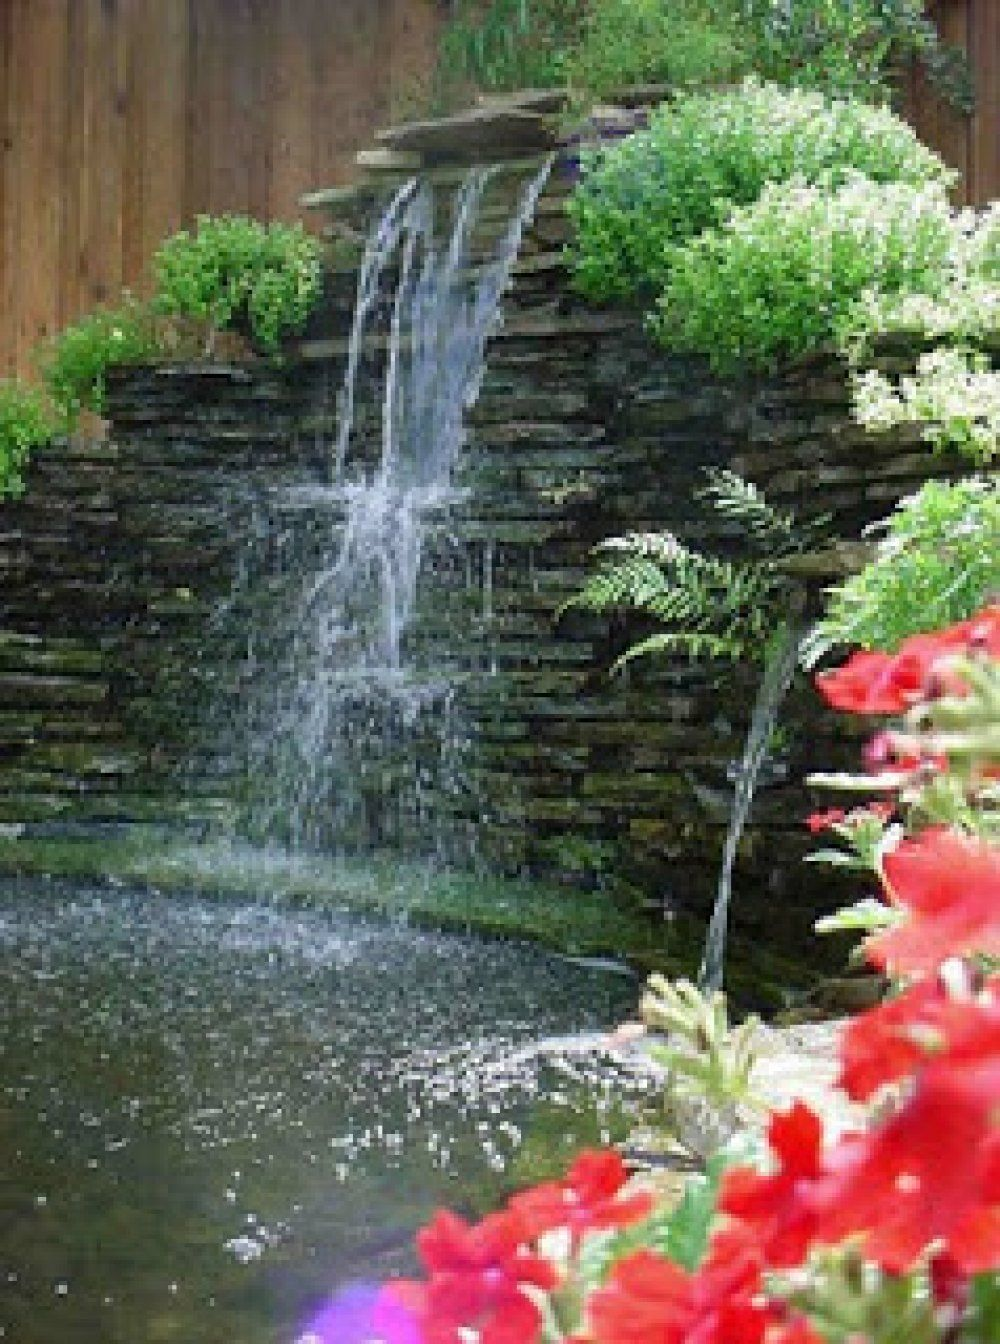 Pondless waterfall design ideas – unique garden water features